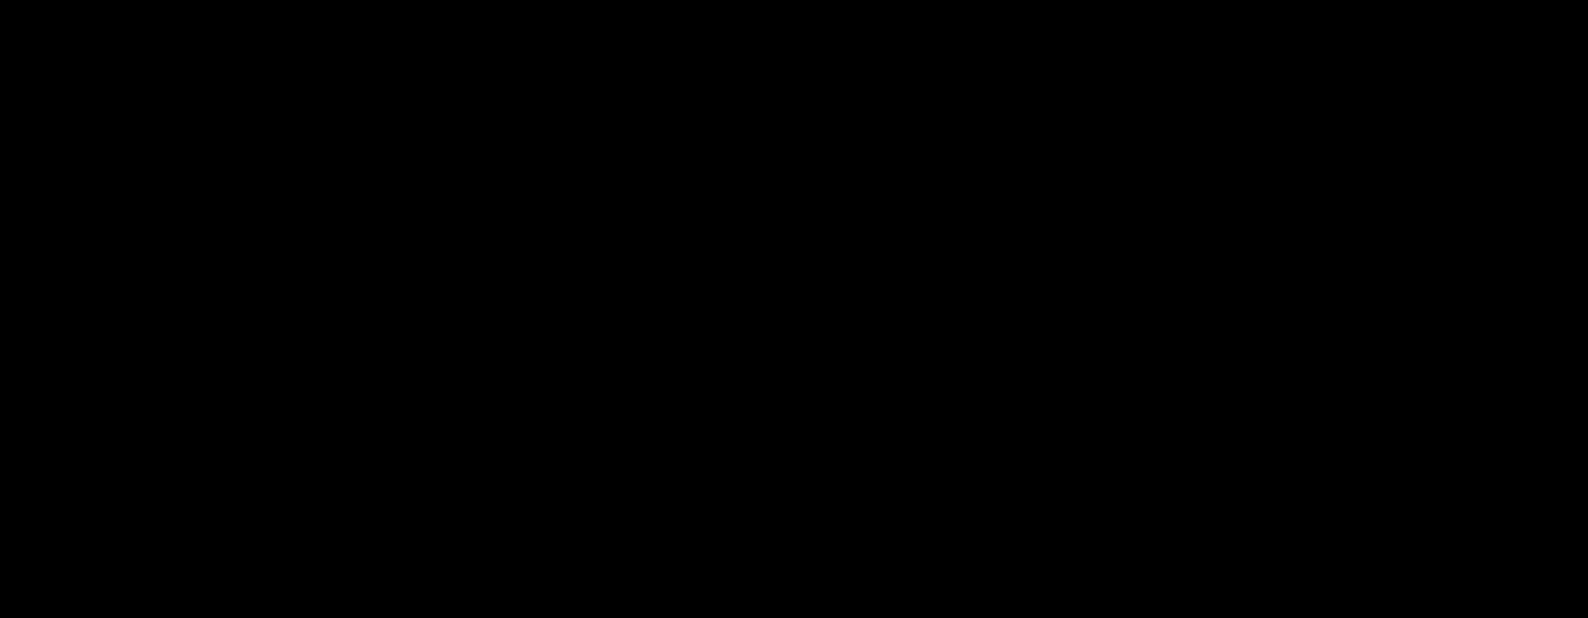 Procaine-d<sub>4</sub> hydrochloride